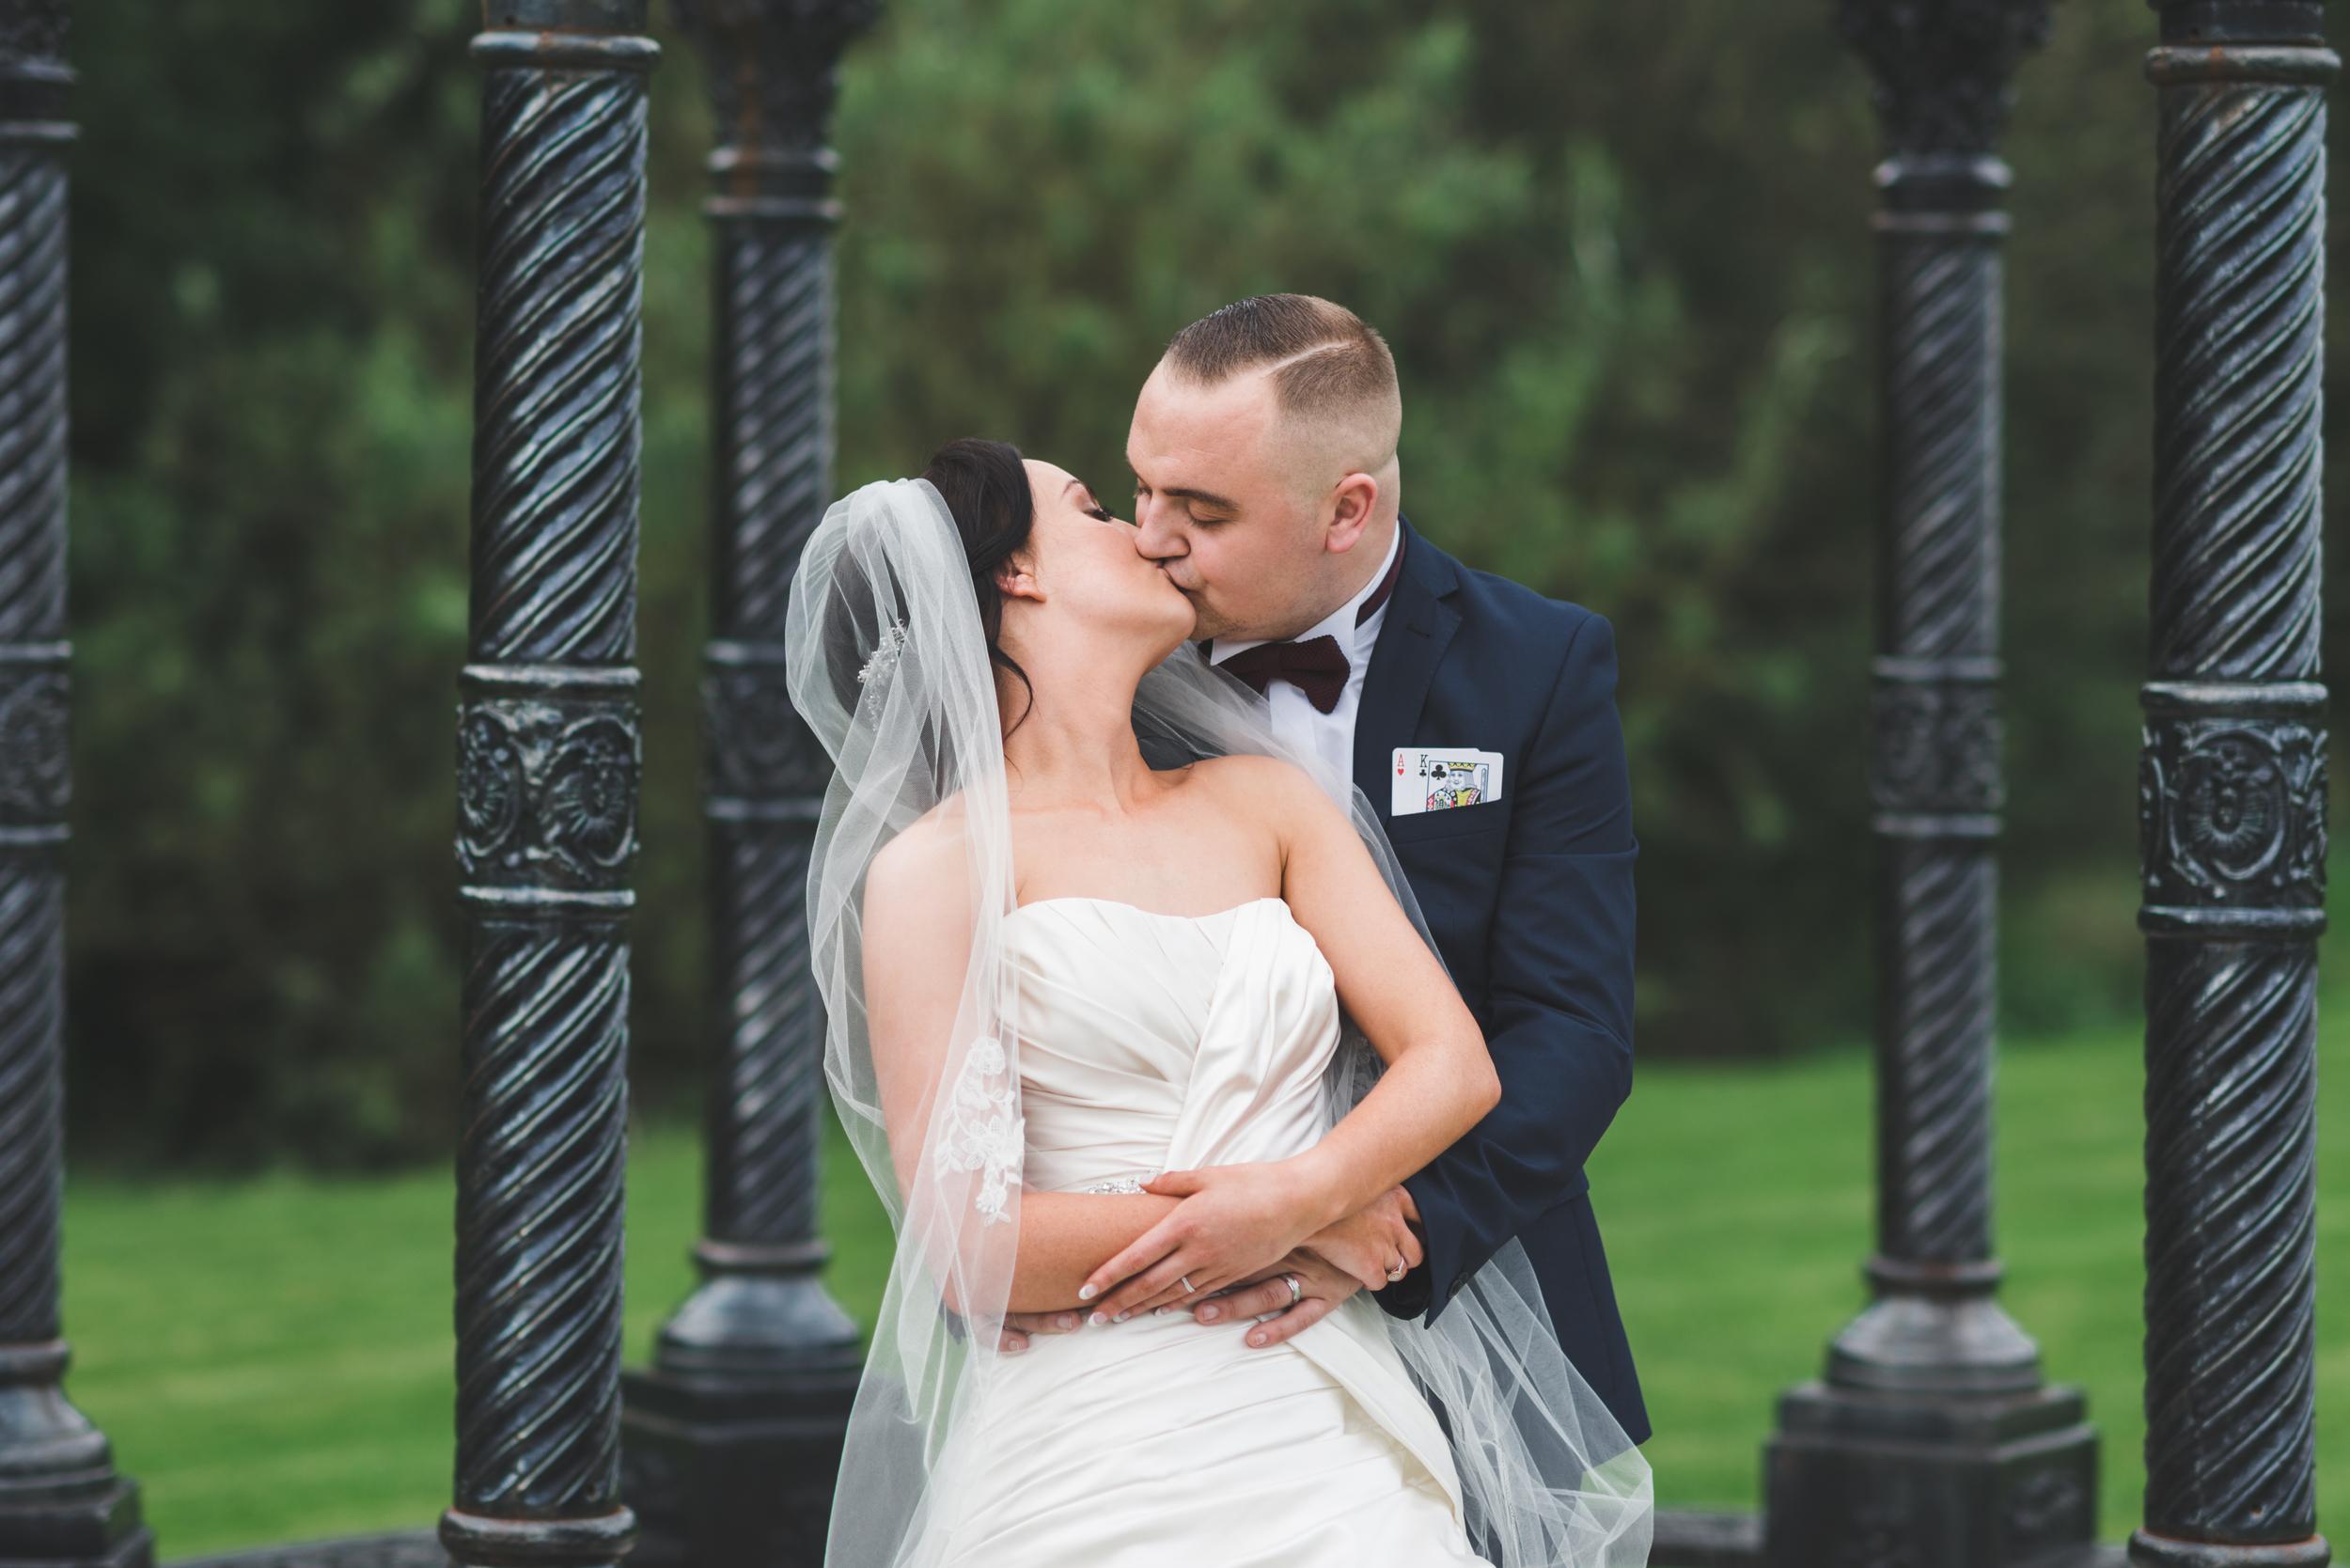 Northern_Ireland_Wedding_Photographer_Purephotoni_Dunsilly_Hotel_Wedding_Portraits